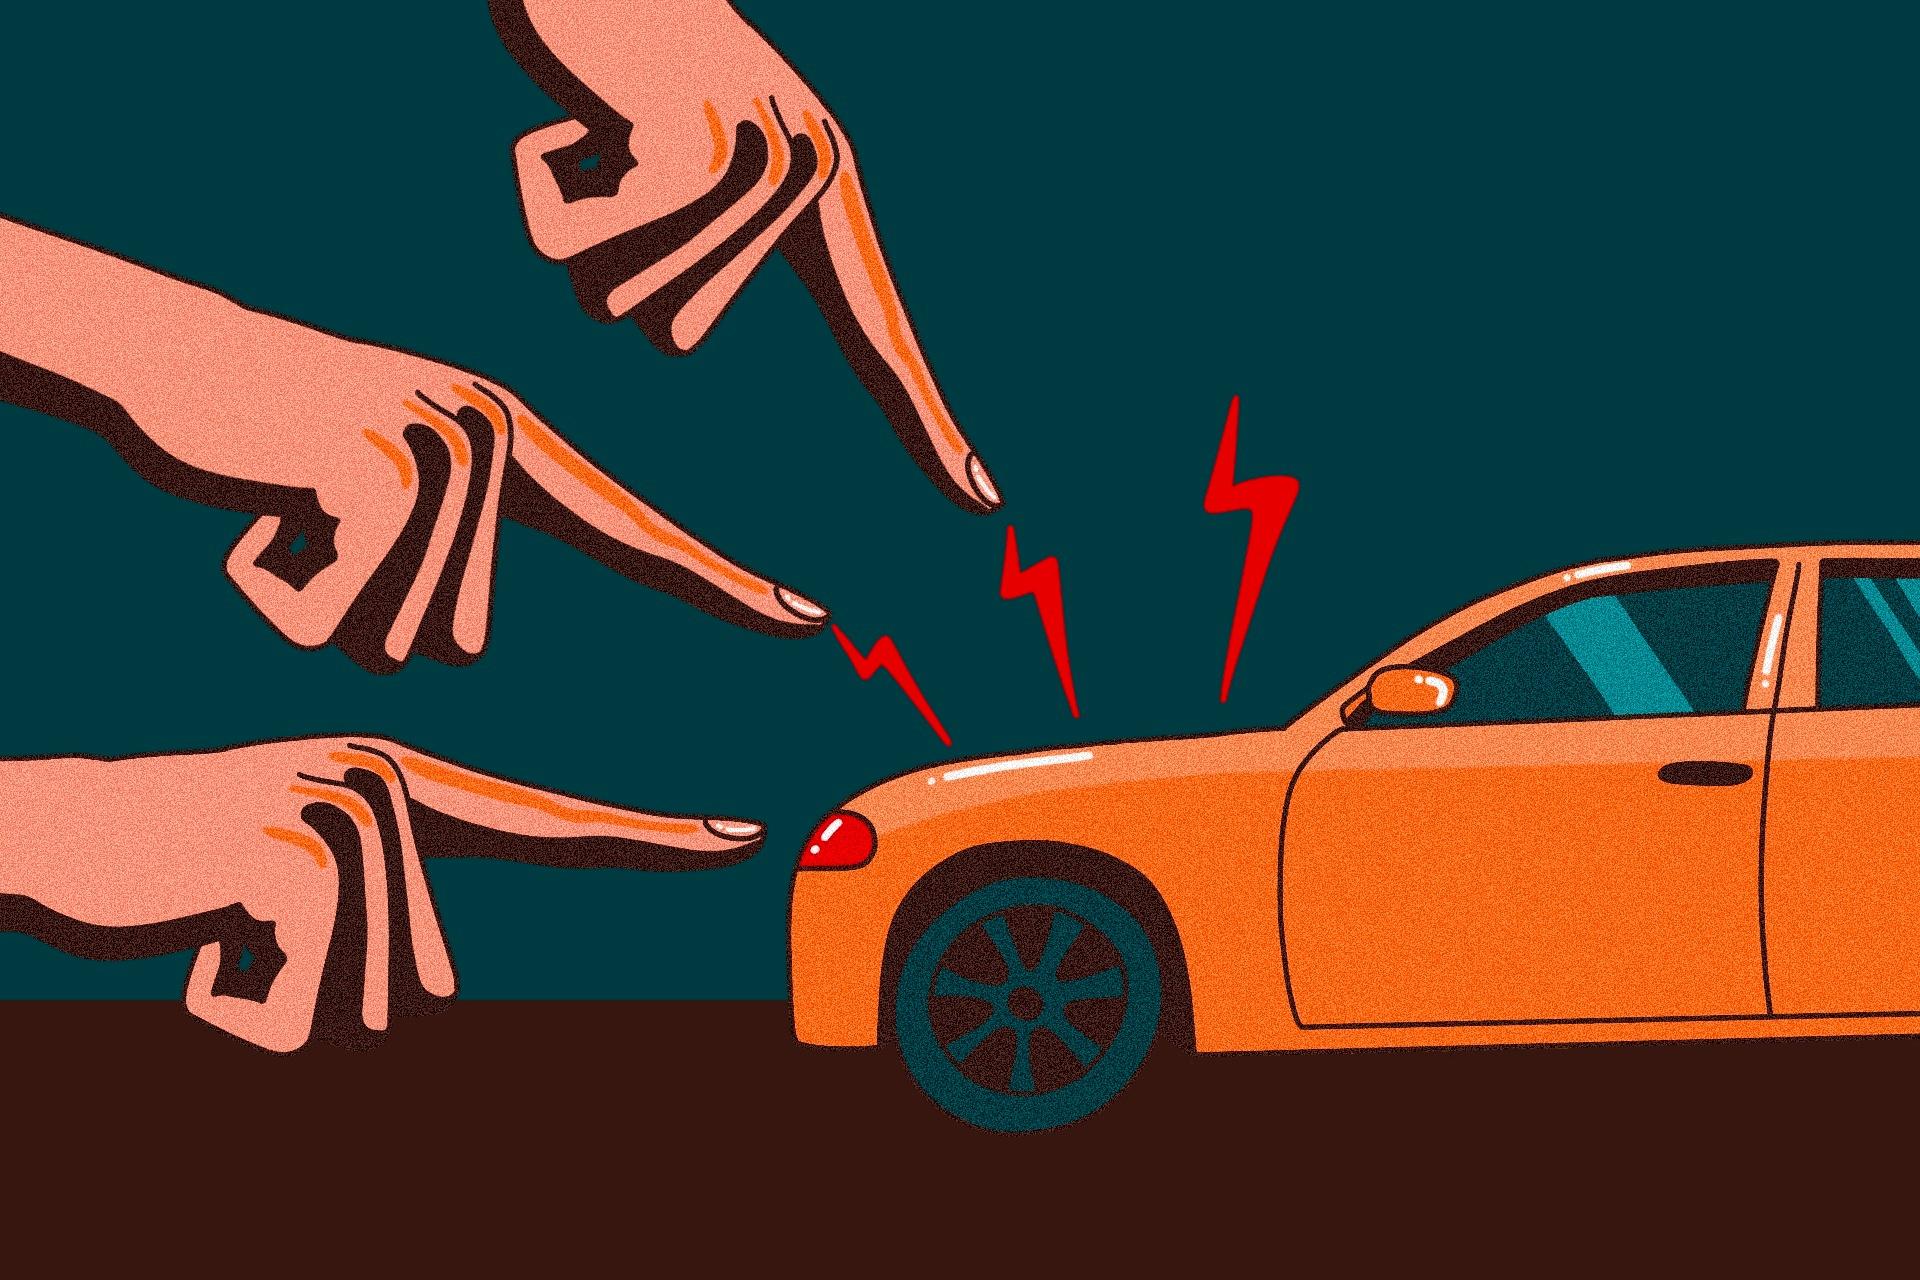 Сексизм на дорогах